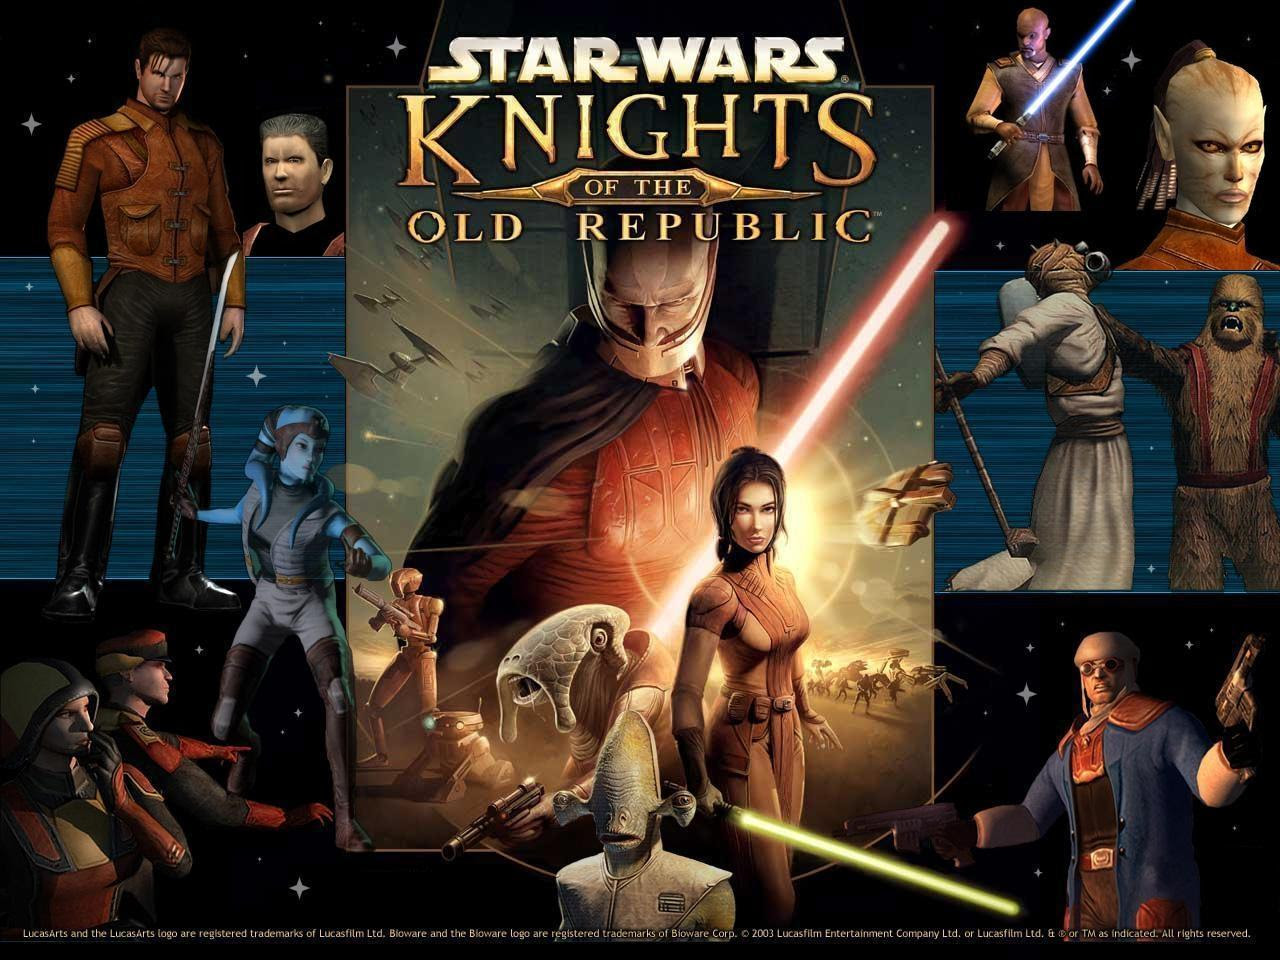 Knights Of The Old Republic Star Wars Wallpaper 9368710 Fanpop